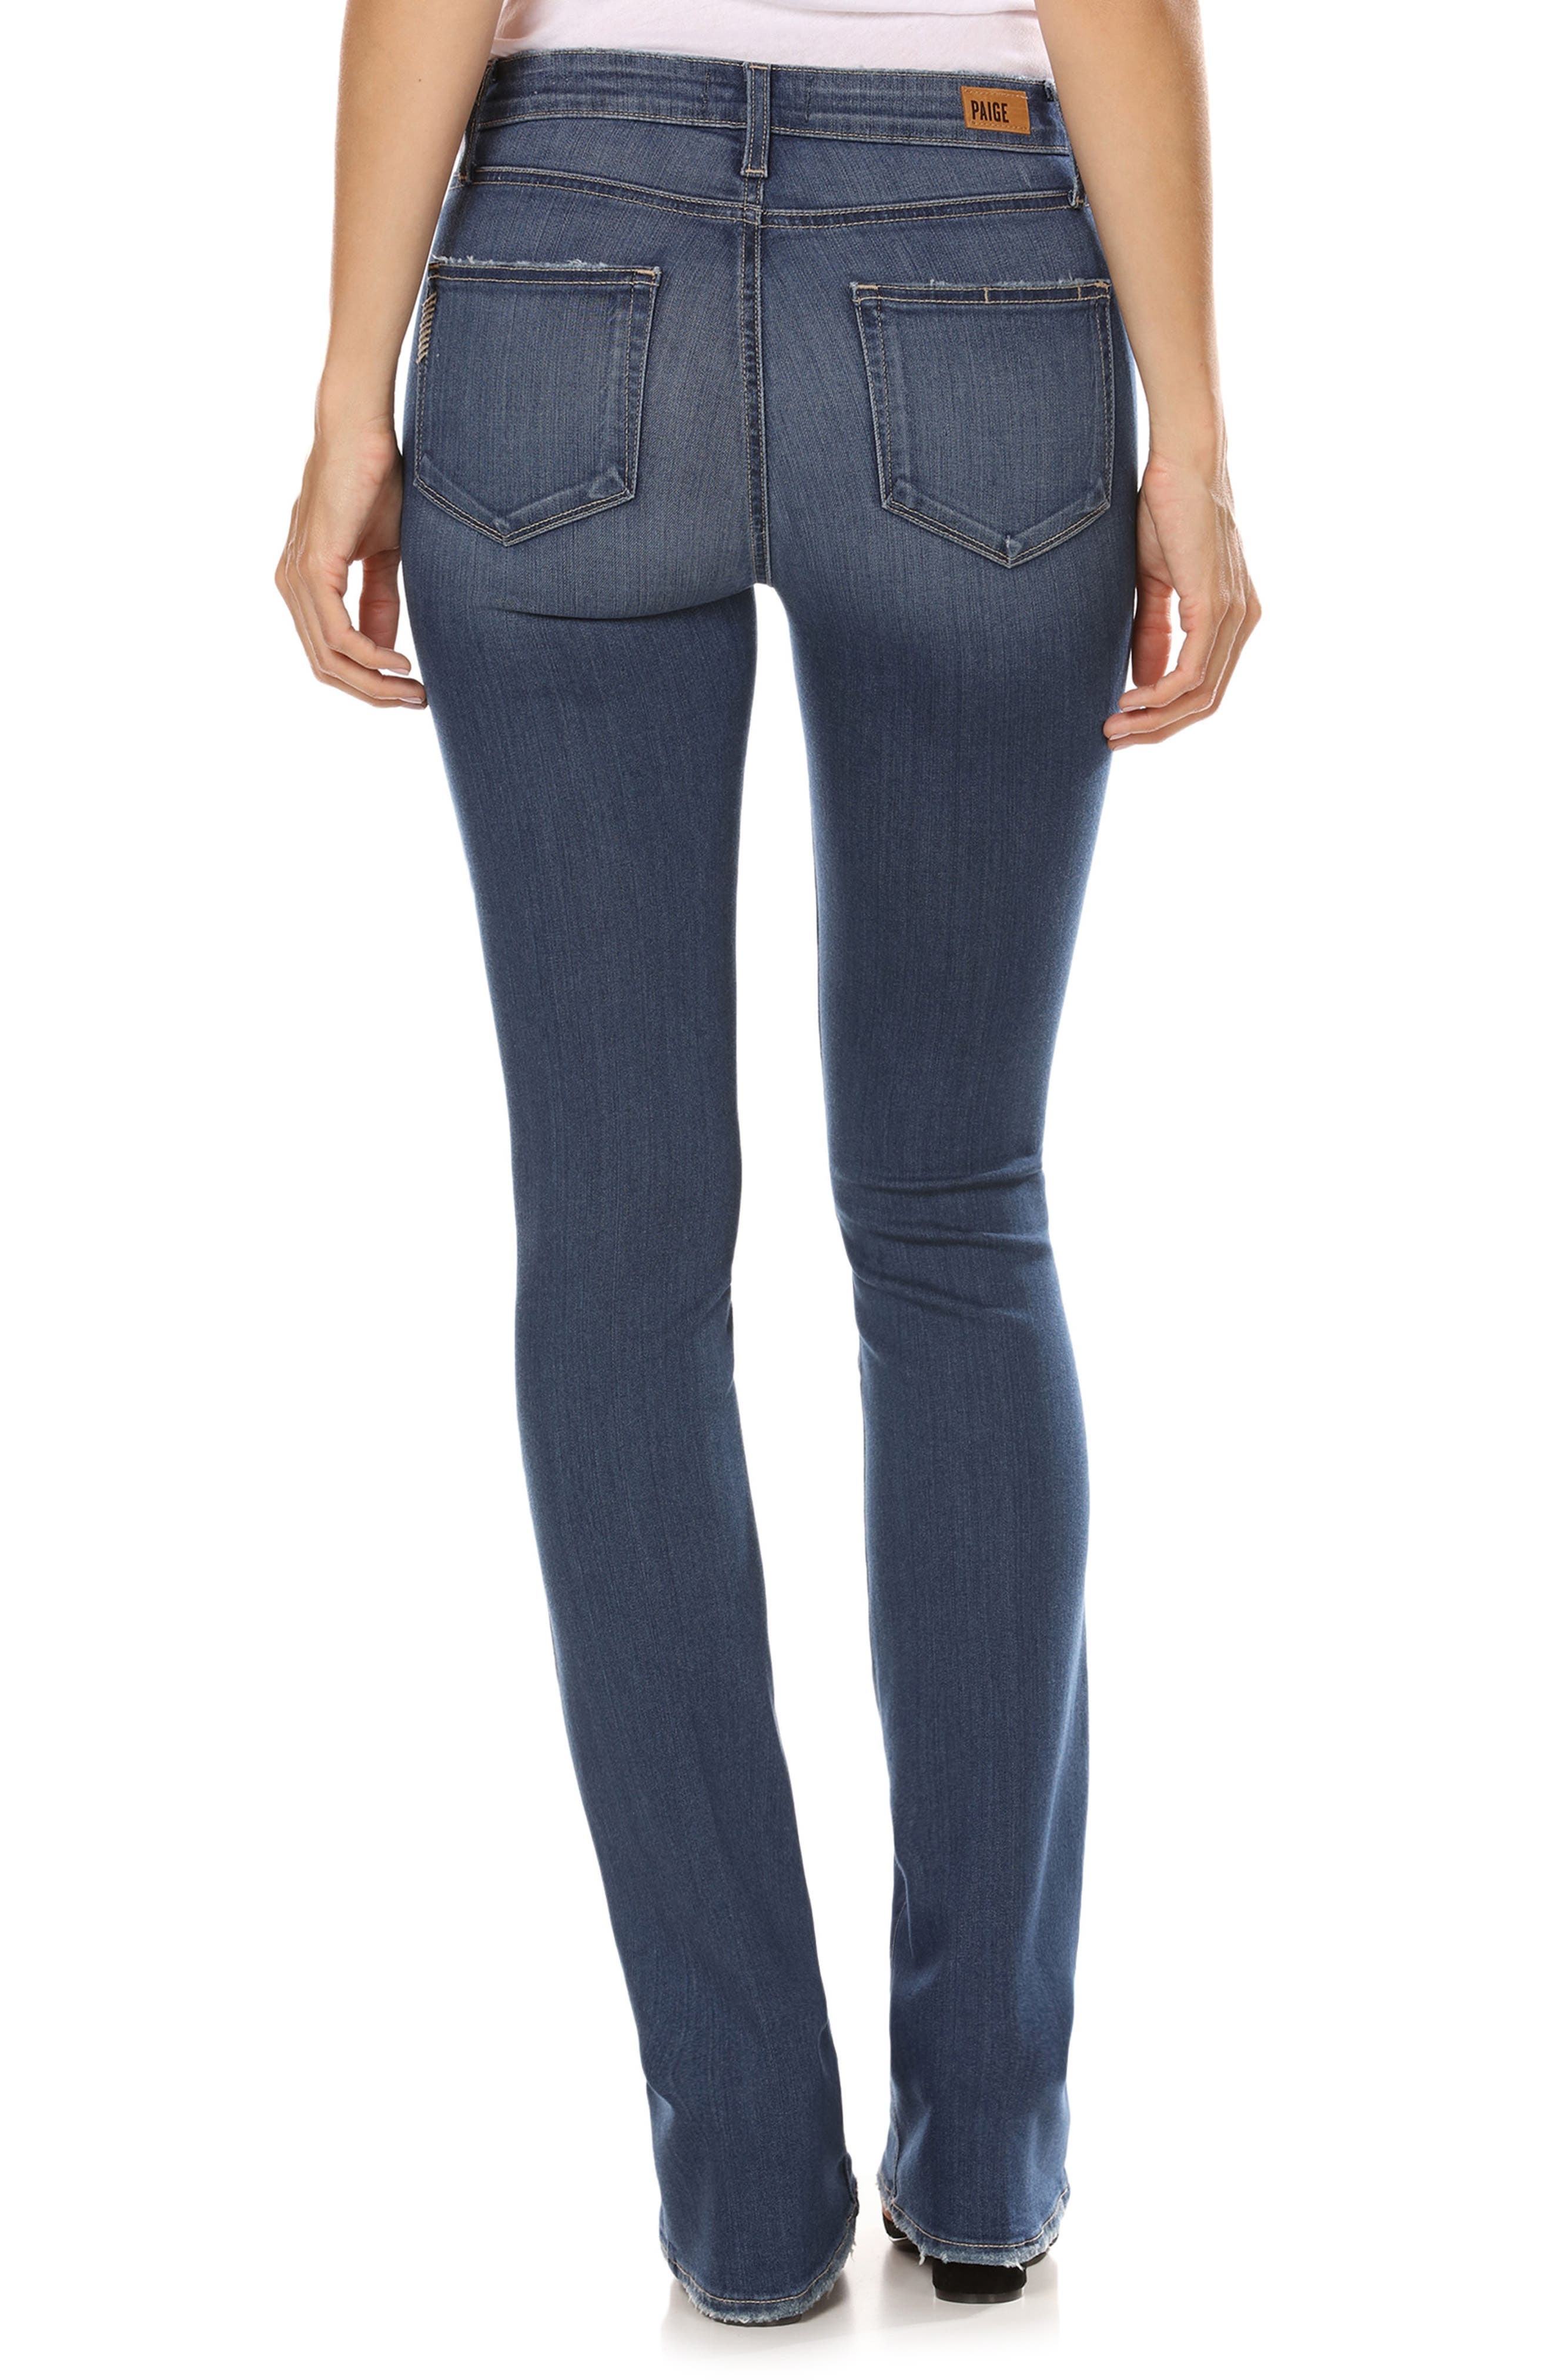 Transcend - Manhattan High Waist Bootcut Jeans,                             Alternate thumbnail 2, color,